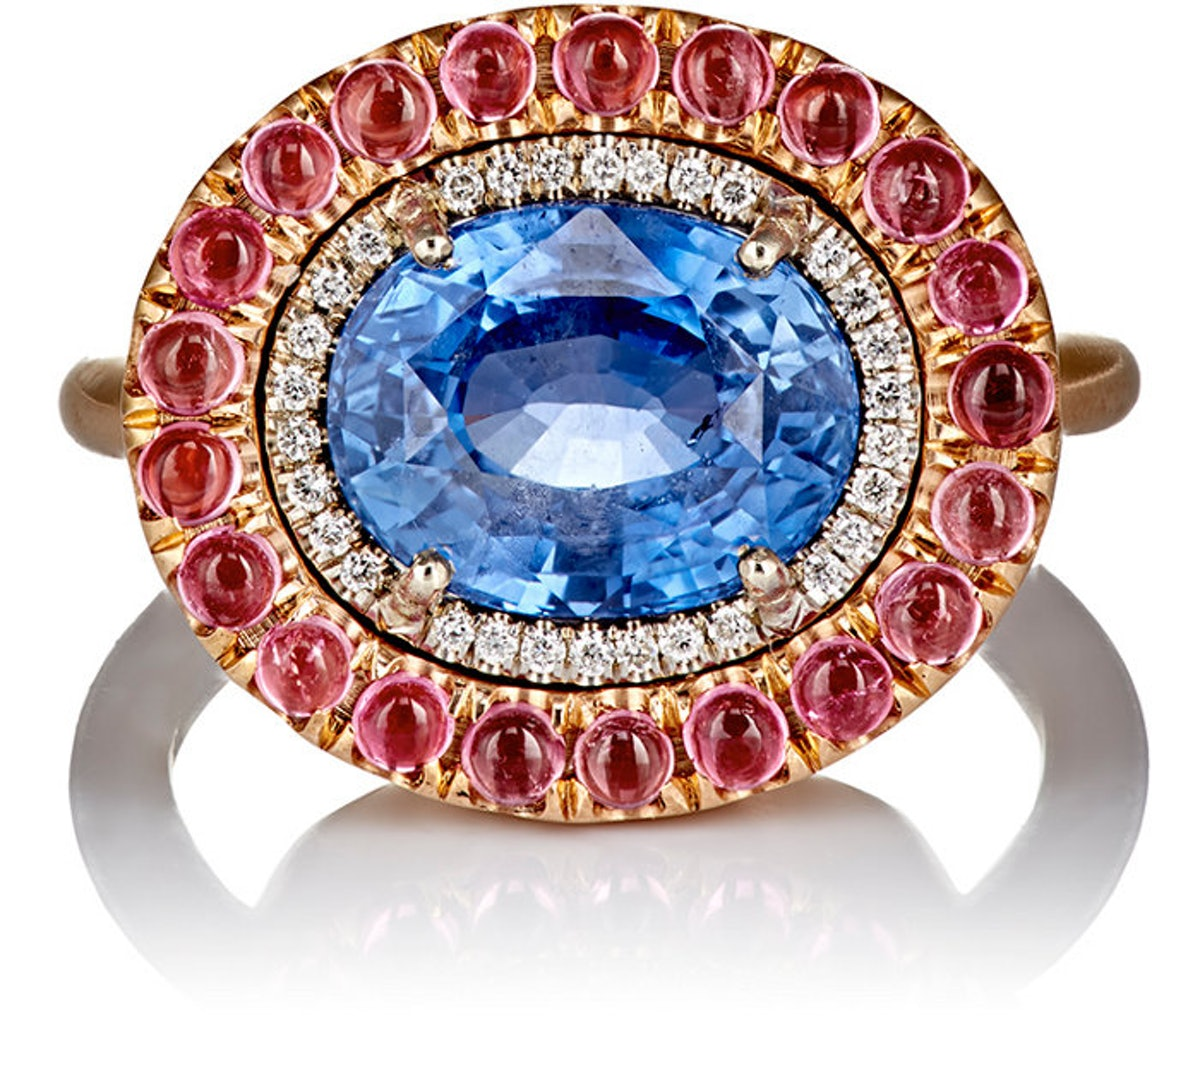 Irene Neuwirth Diamond Collection ring, $13,180, barneys.com